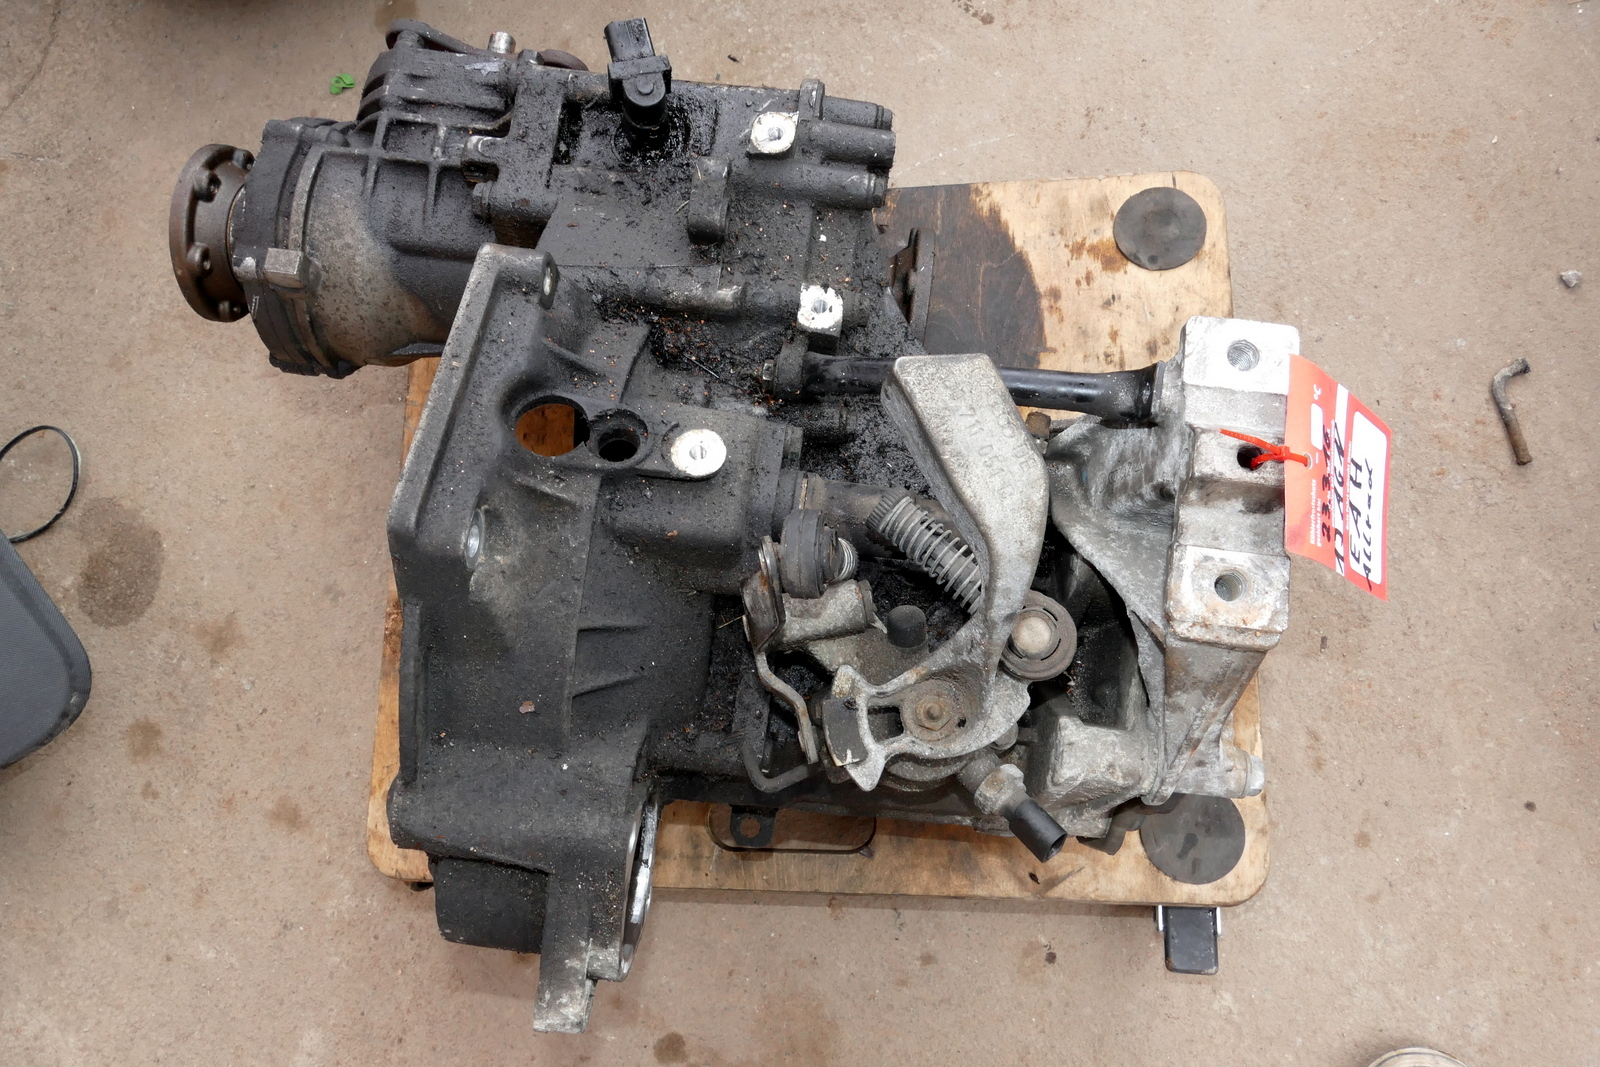 von AZQ BME Motor 111.000km VW Polo 9N Fox Getriebe GKU 1,2 47kw  64 PS ca